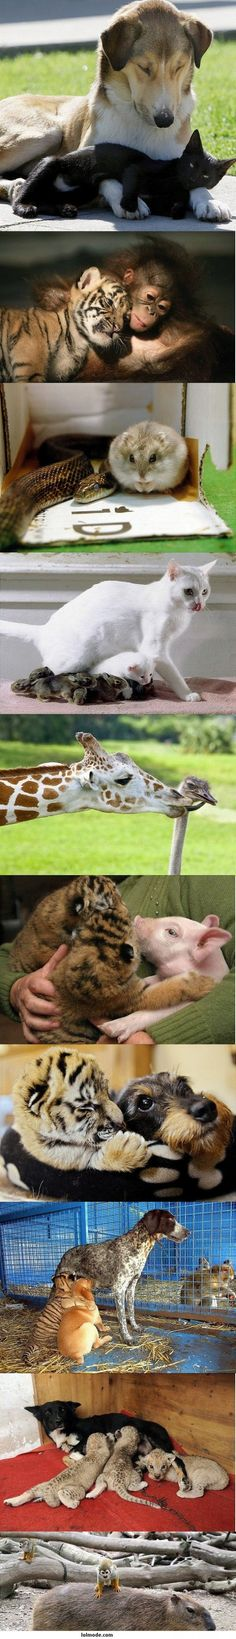 Cute Animal Friendships